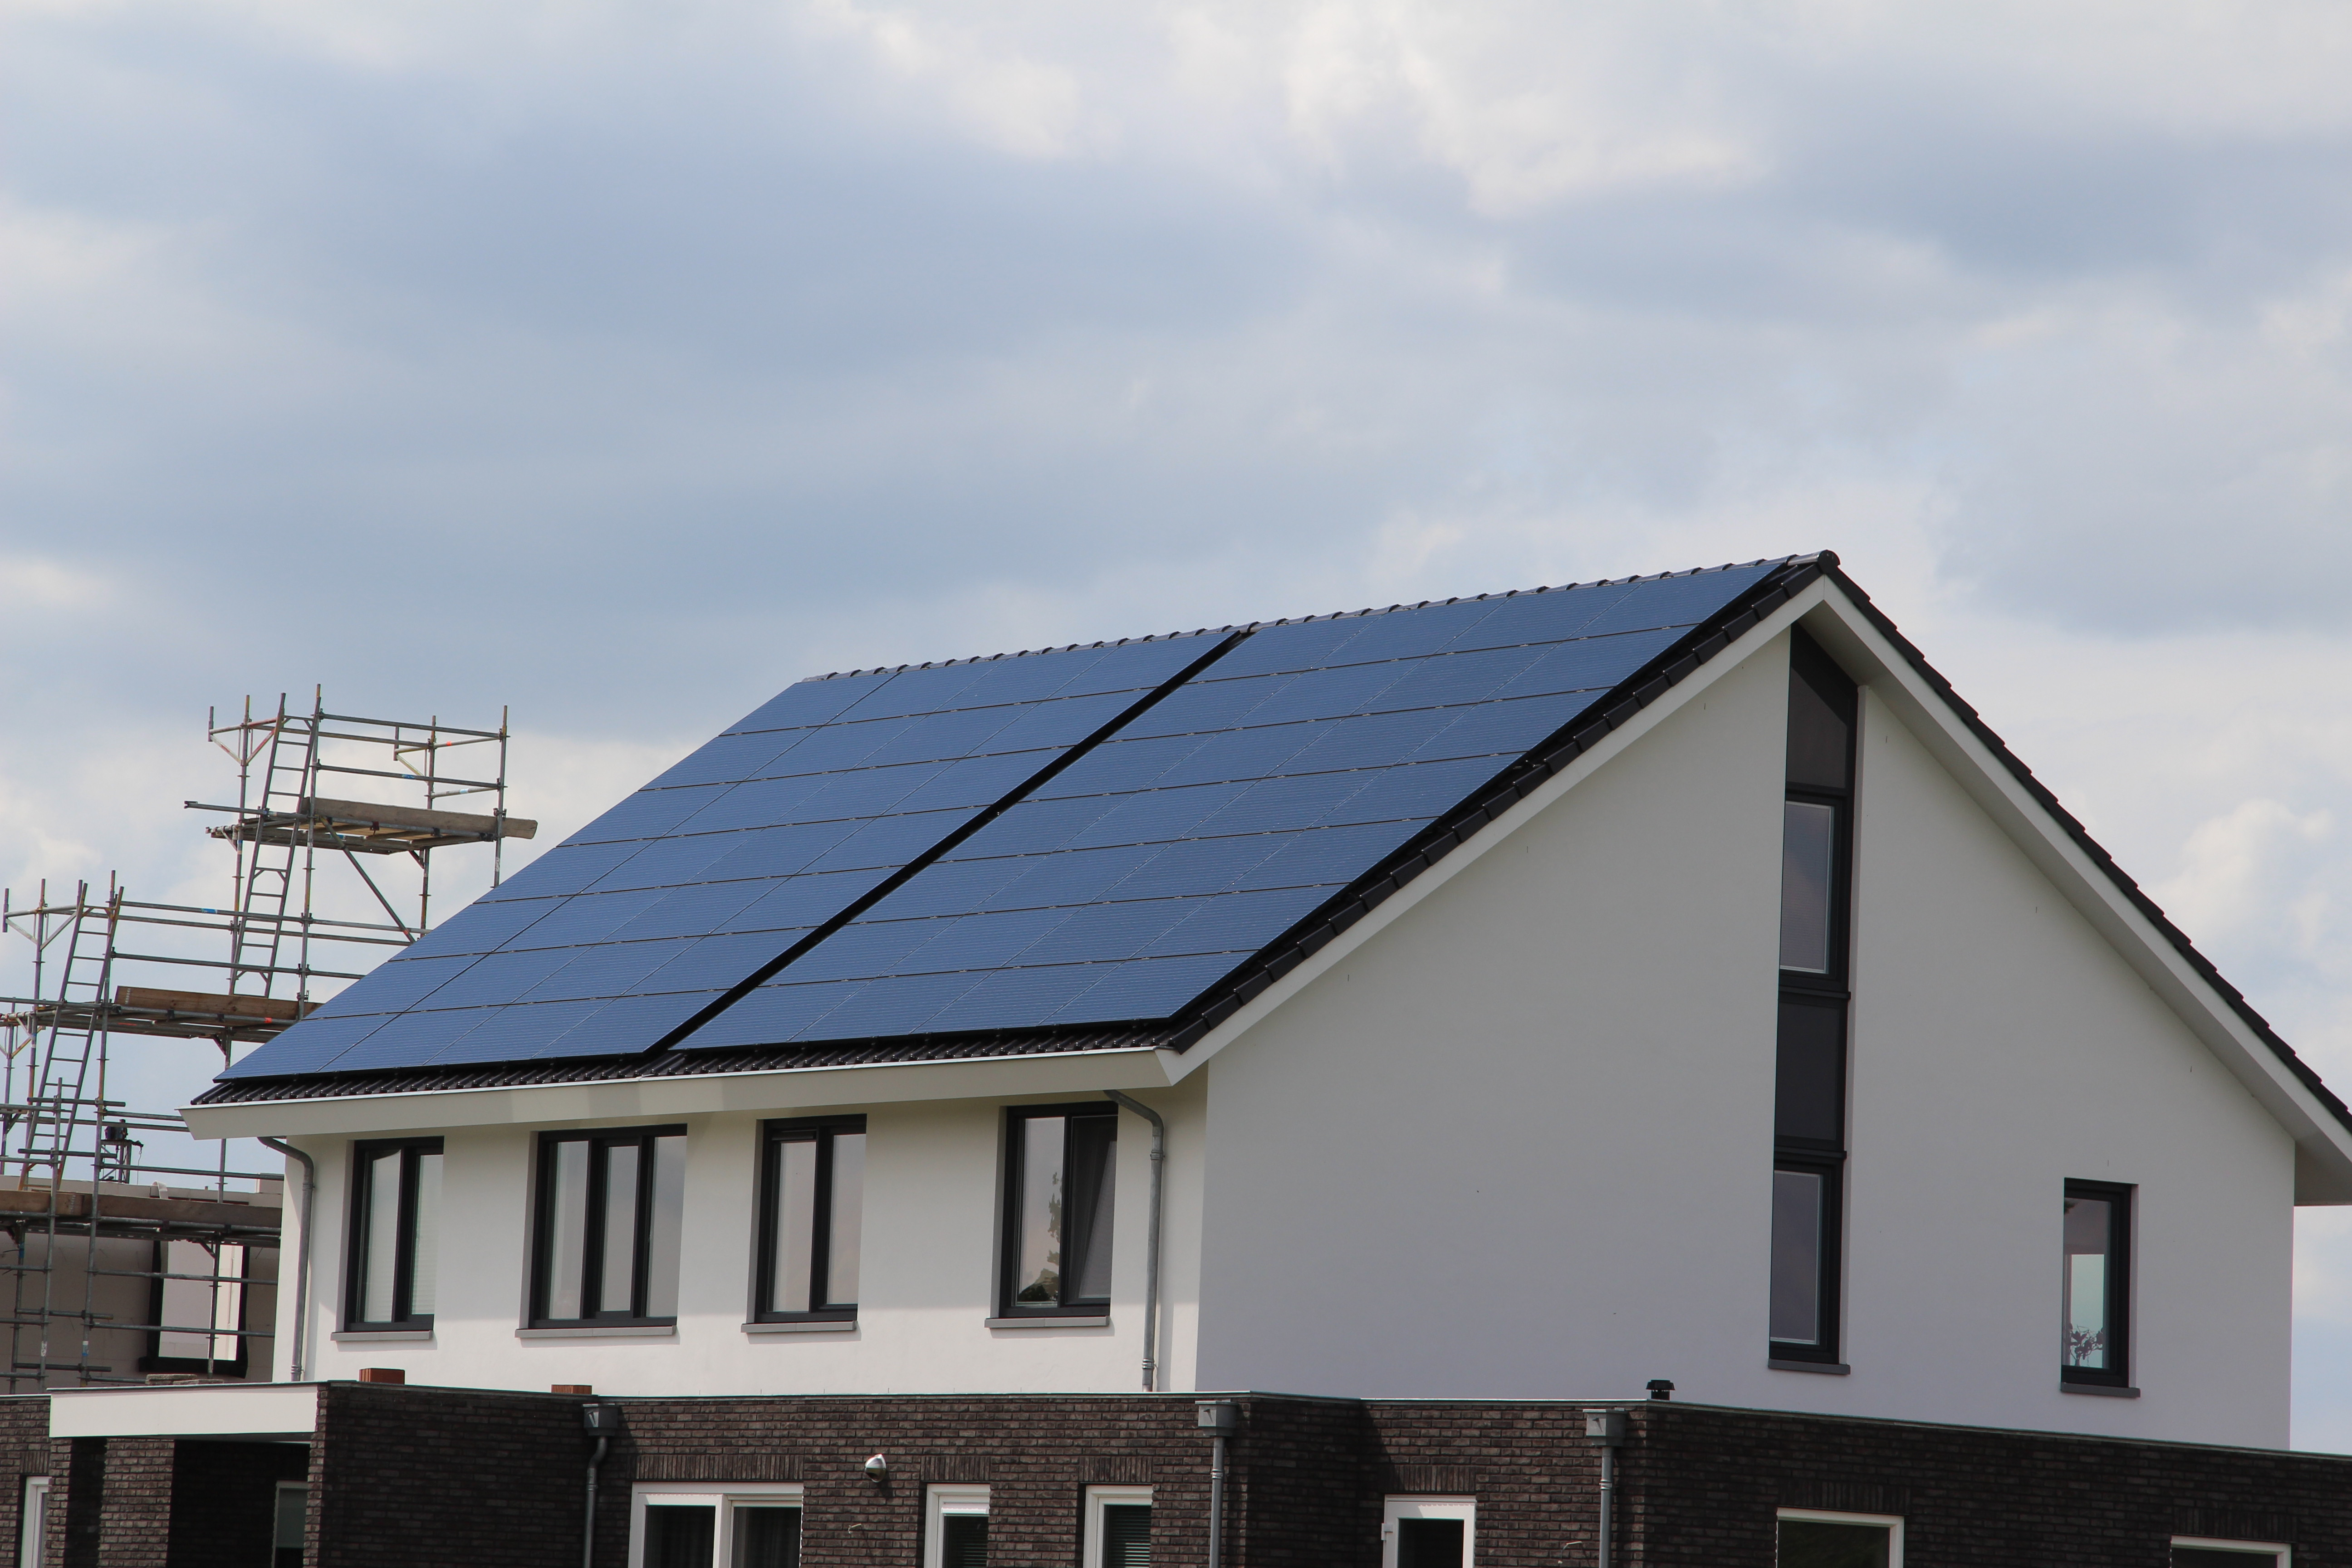 Bouwfout PV op het dak